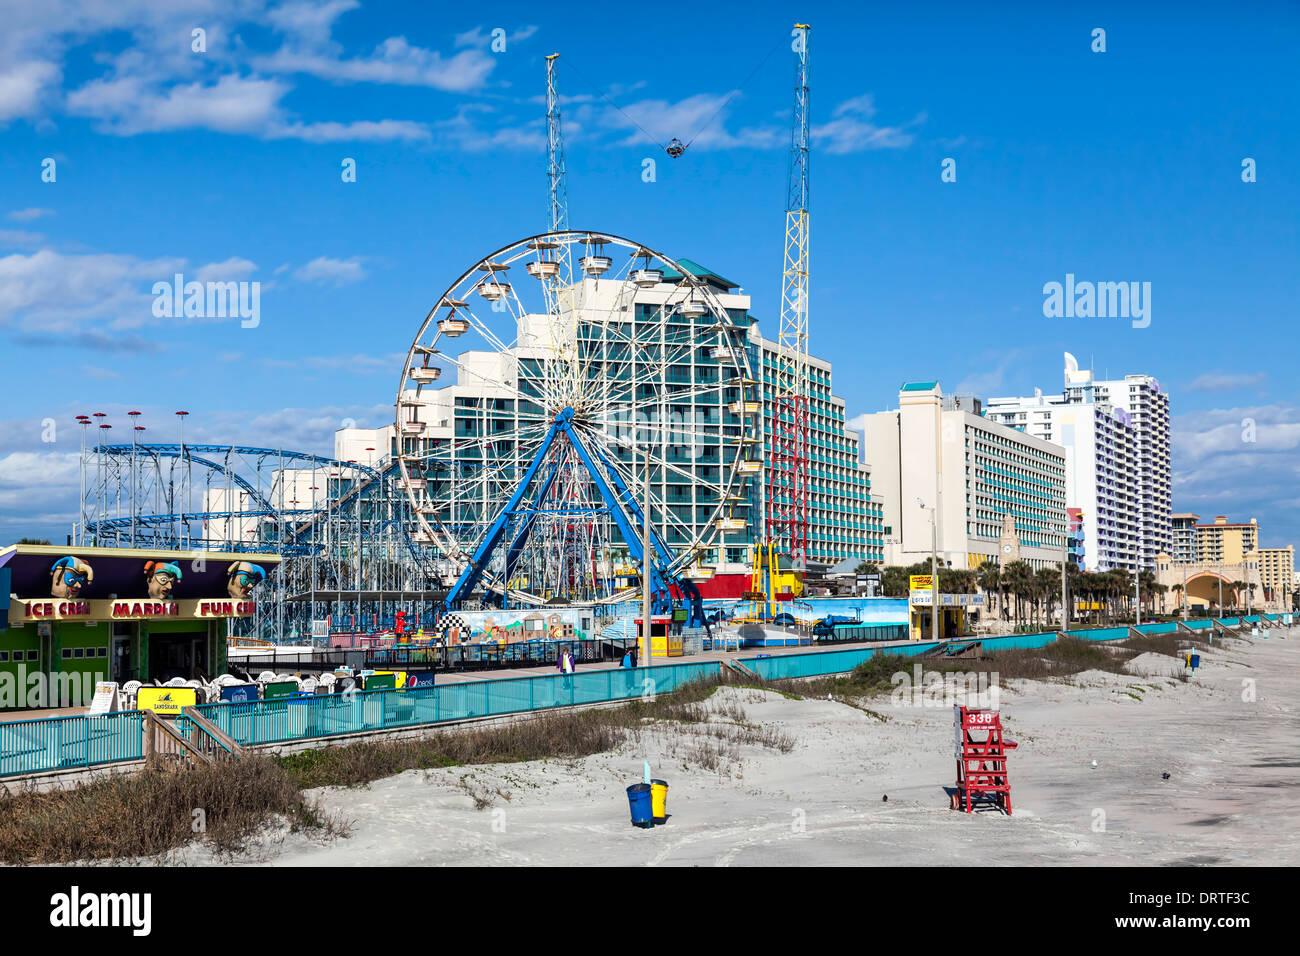 Daytona Beach Florida Boardwalk Hotels